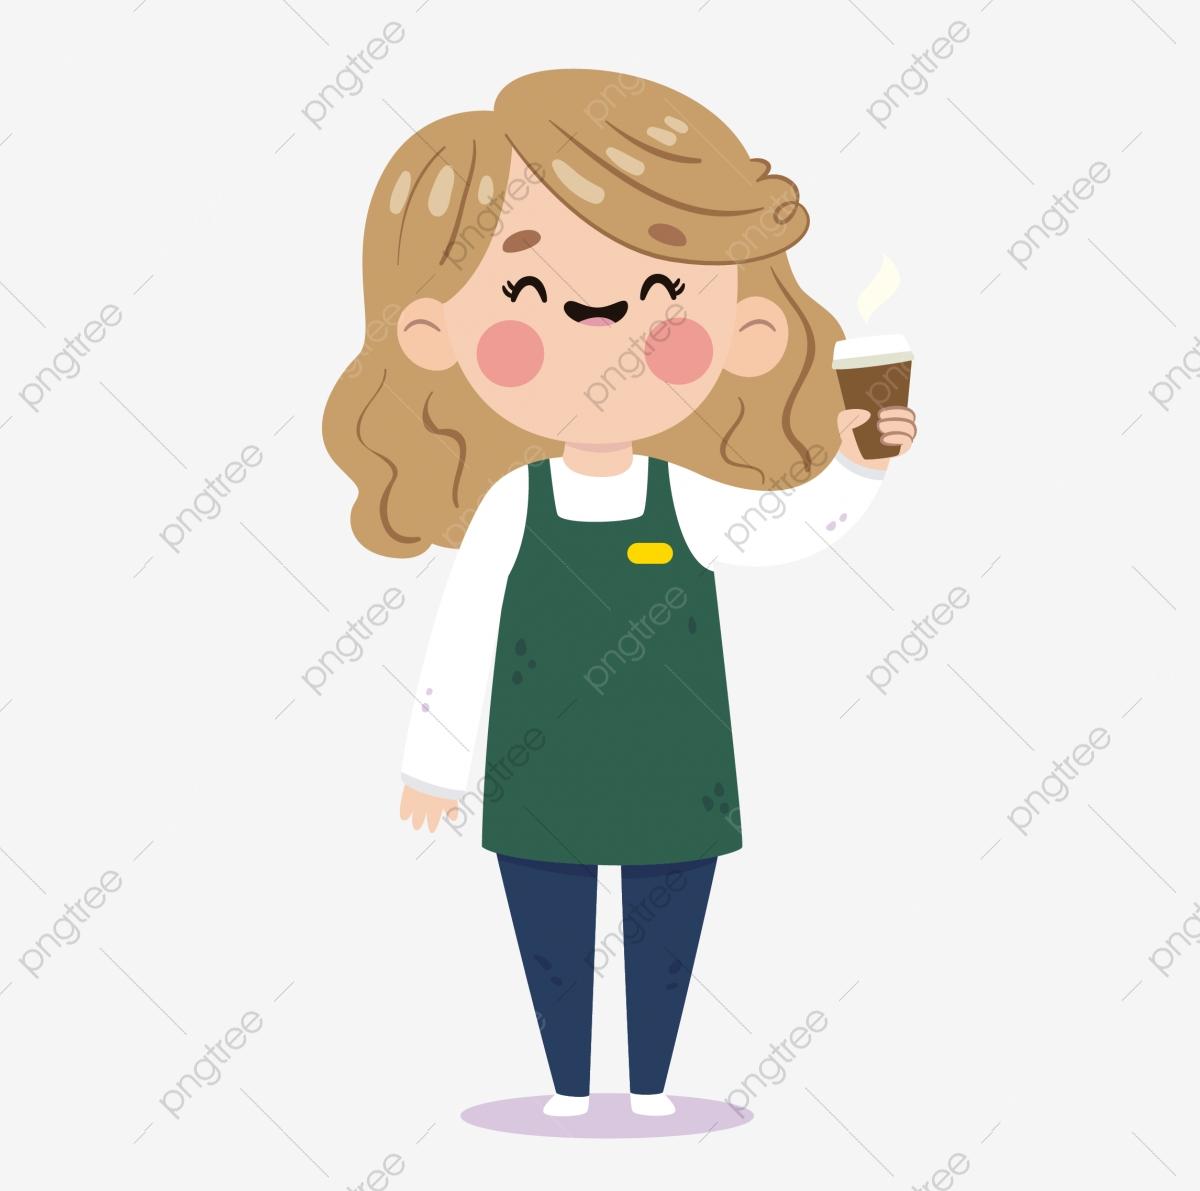 Caterer waiter cartoon beauty. Waitress clipart food catering